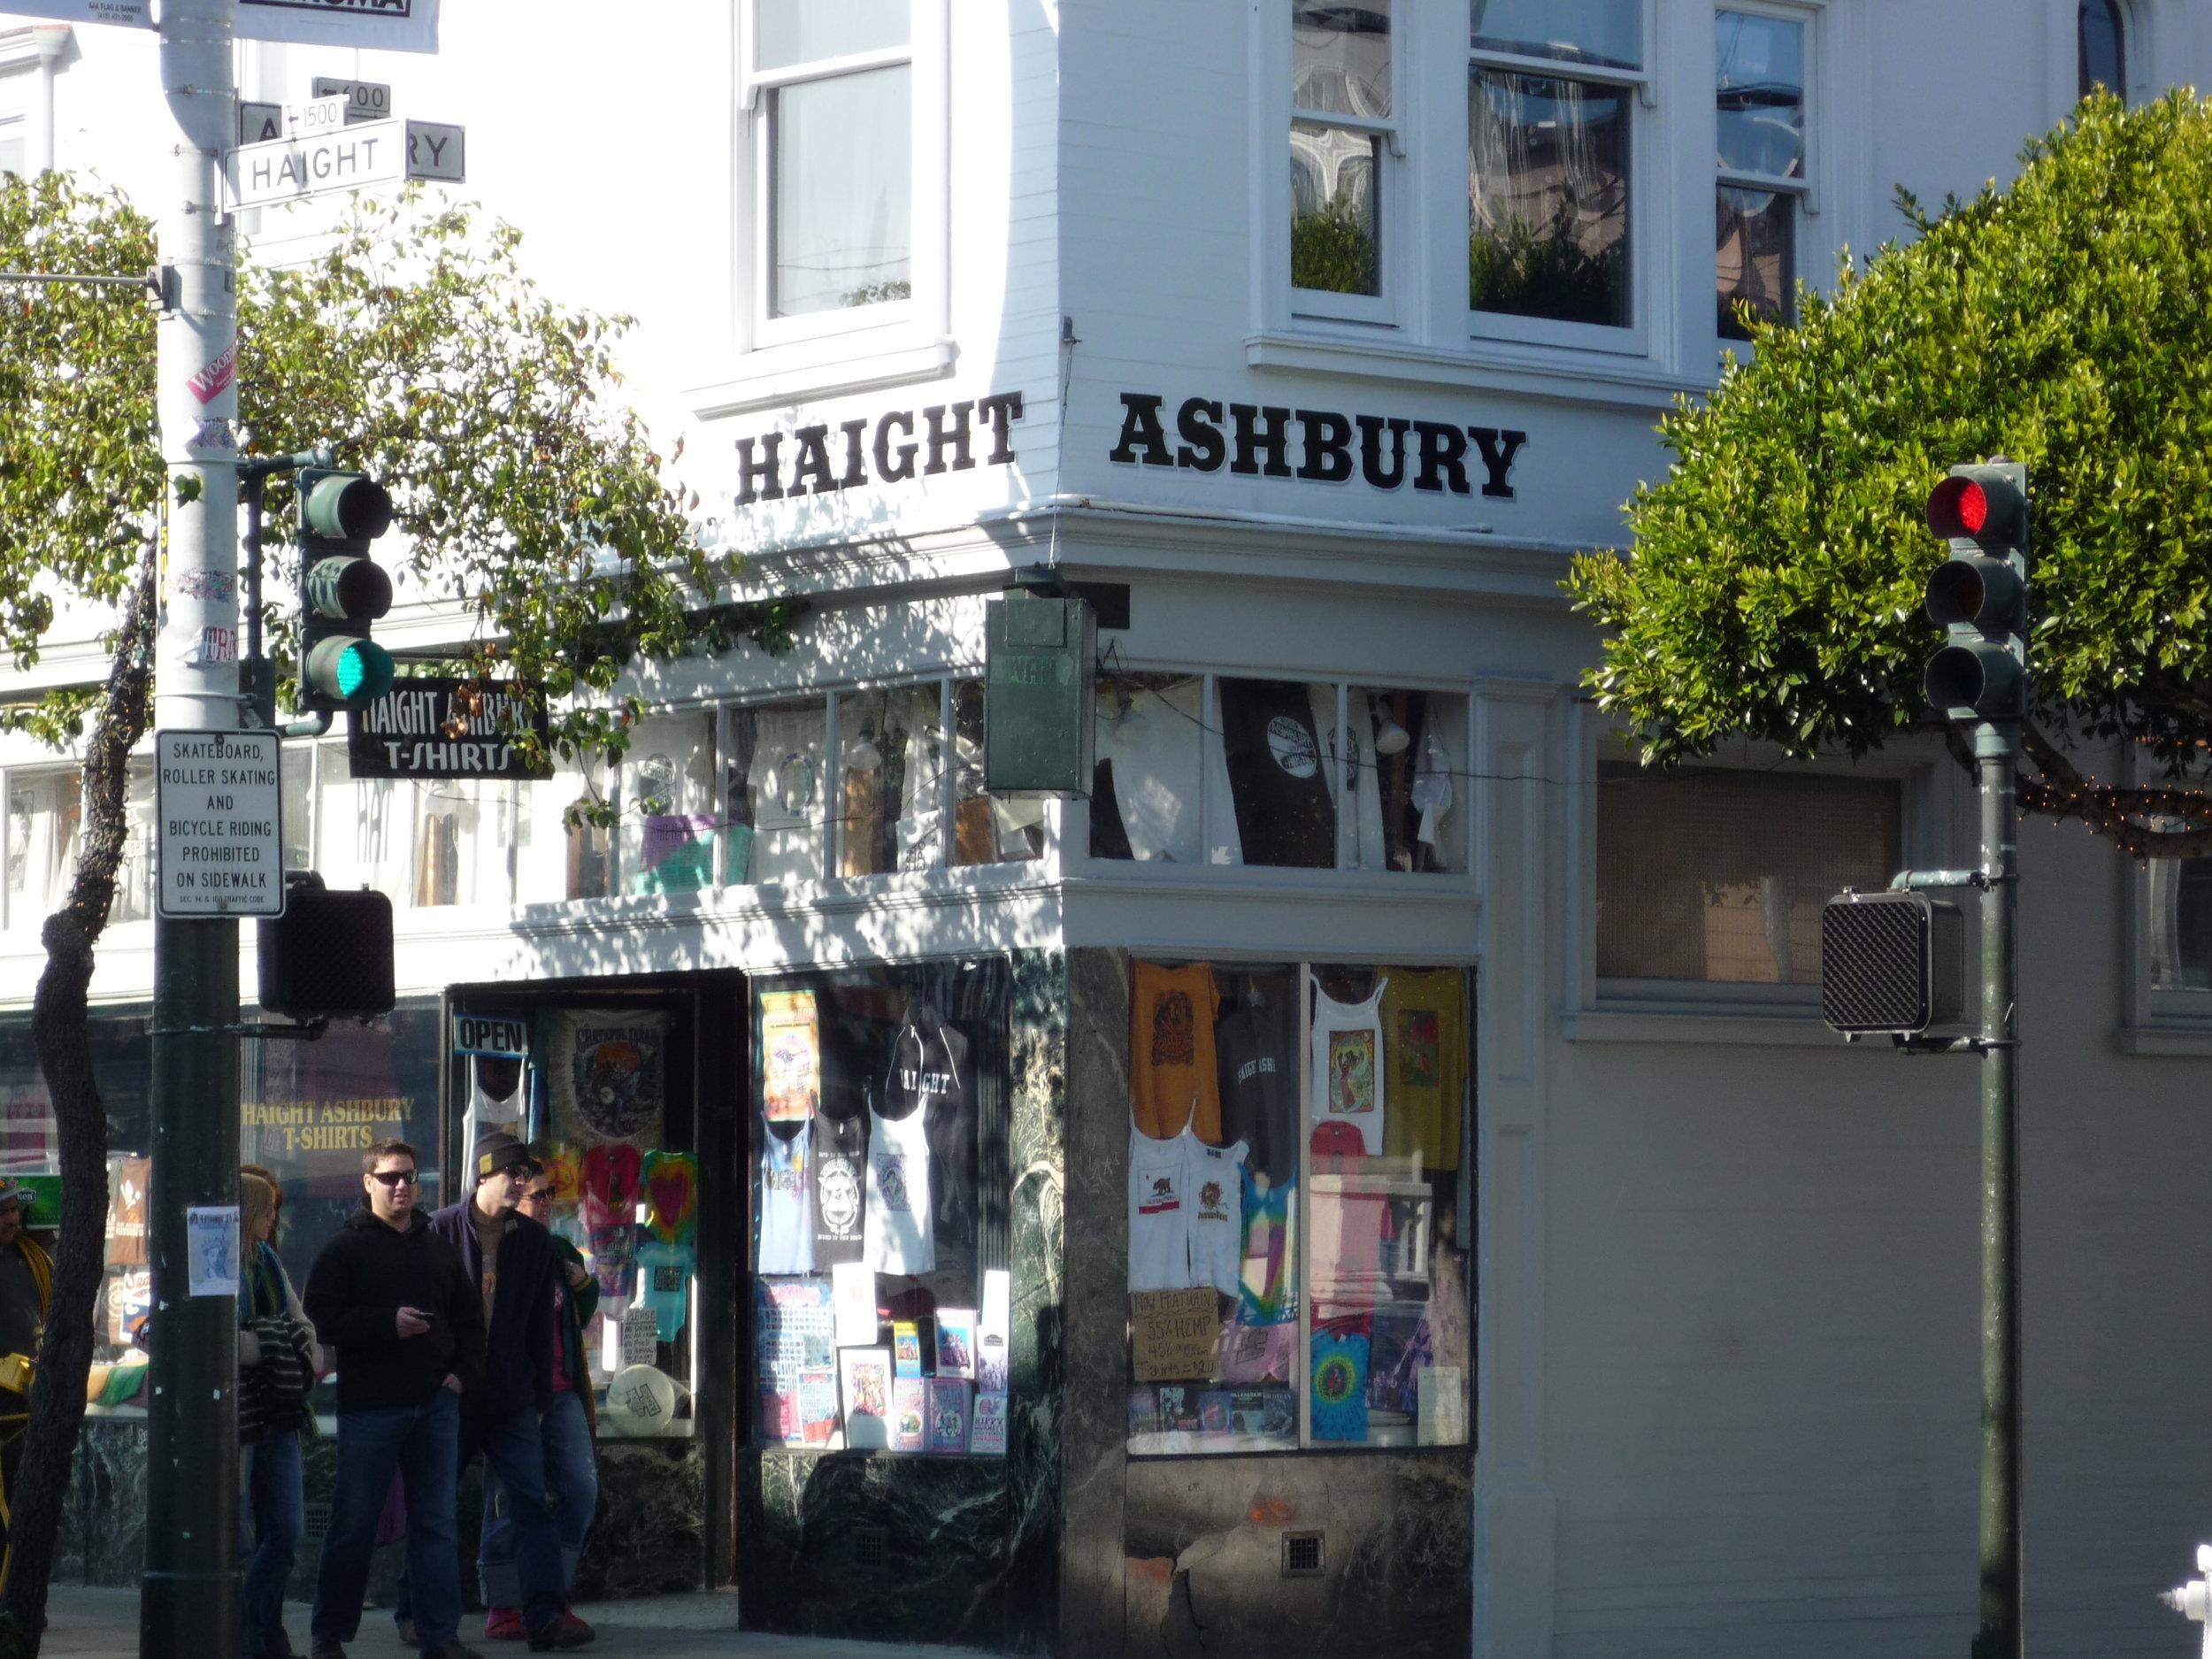 ORIG-haight-ashbury-street-corner_4306546755_o.jpg